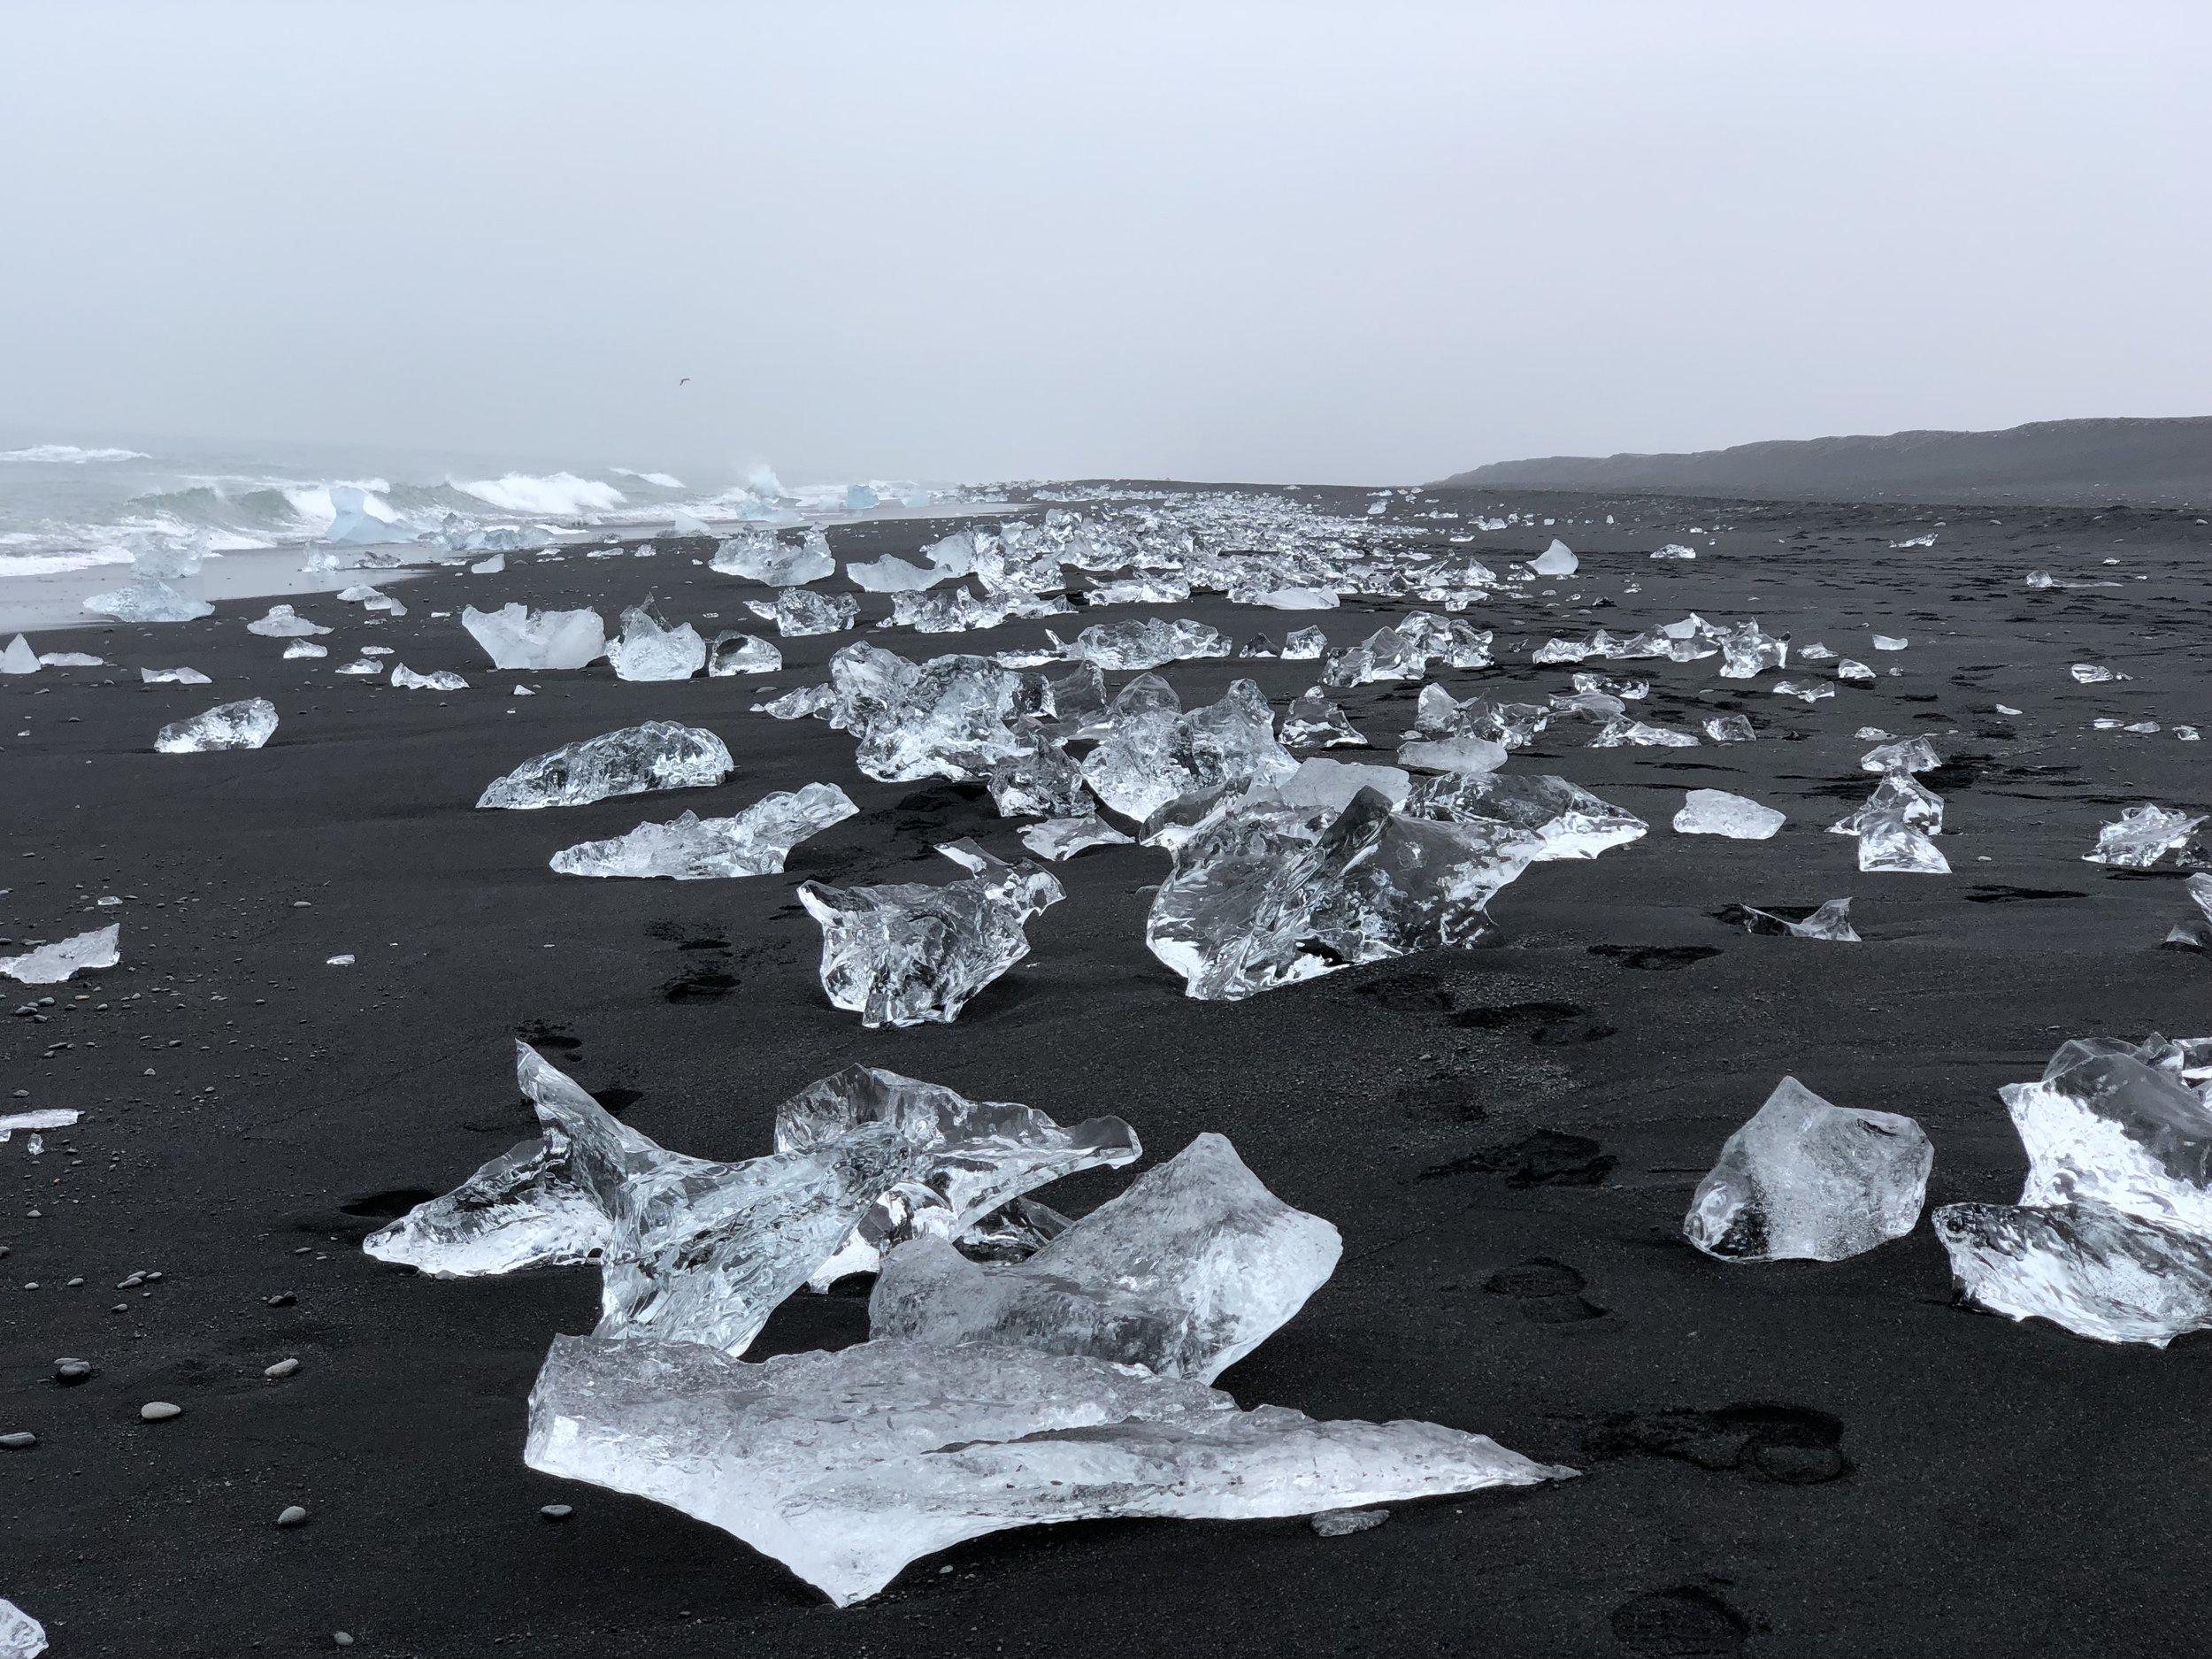 Diamond Beach where large clear ice crystals rest on the black sand.